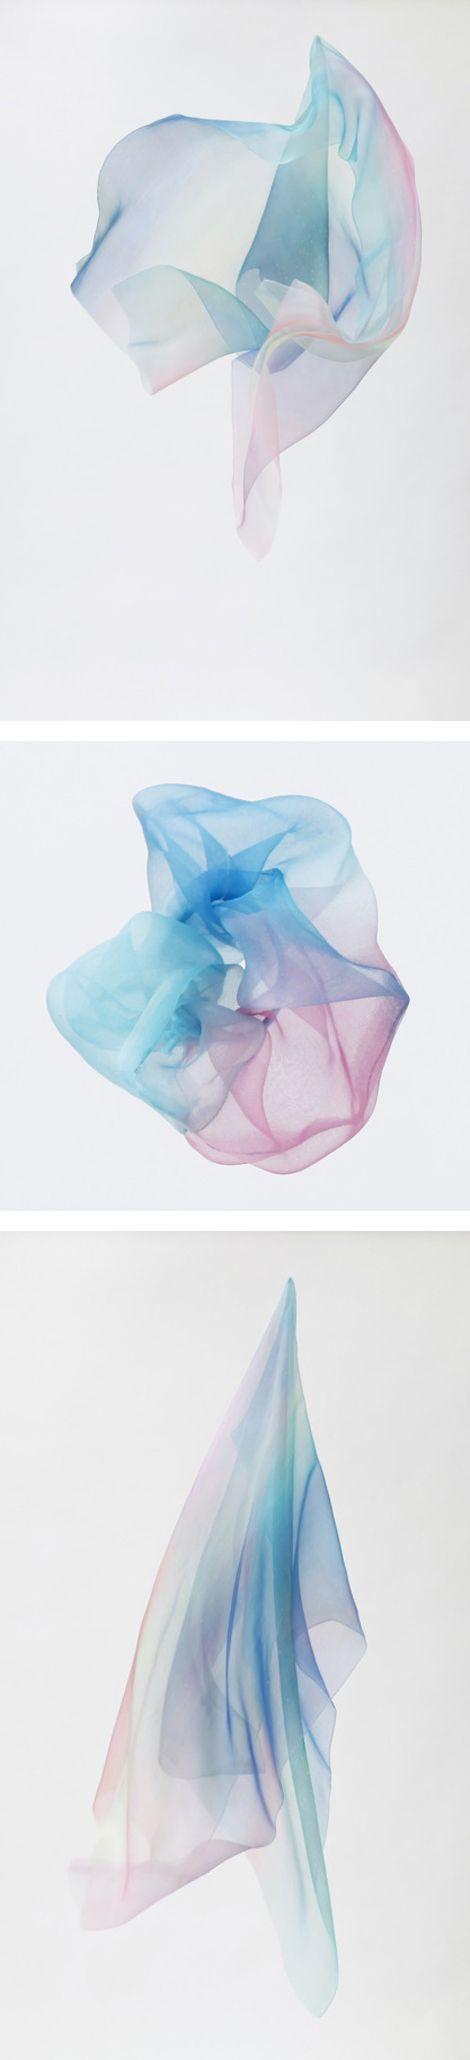 silk scarfs by Yuki Fujisawa. I wouldn't wear one, but they look so pretty....I had to share.